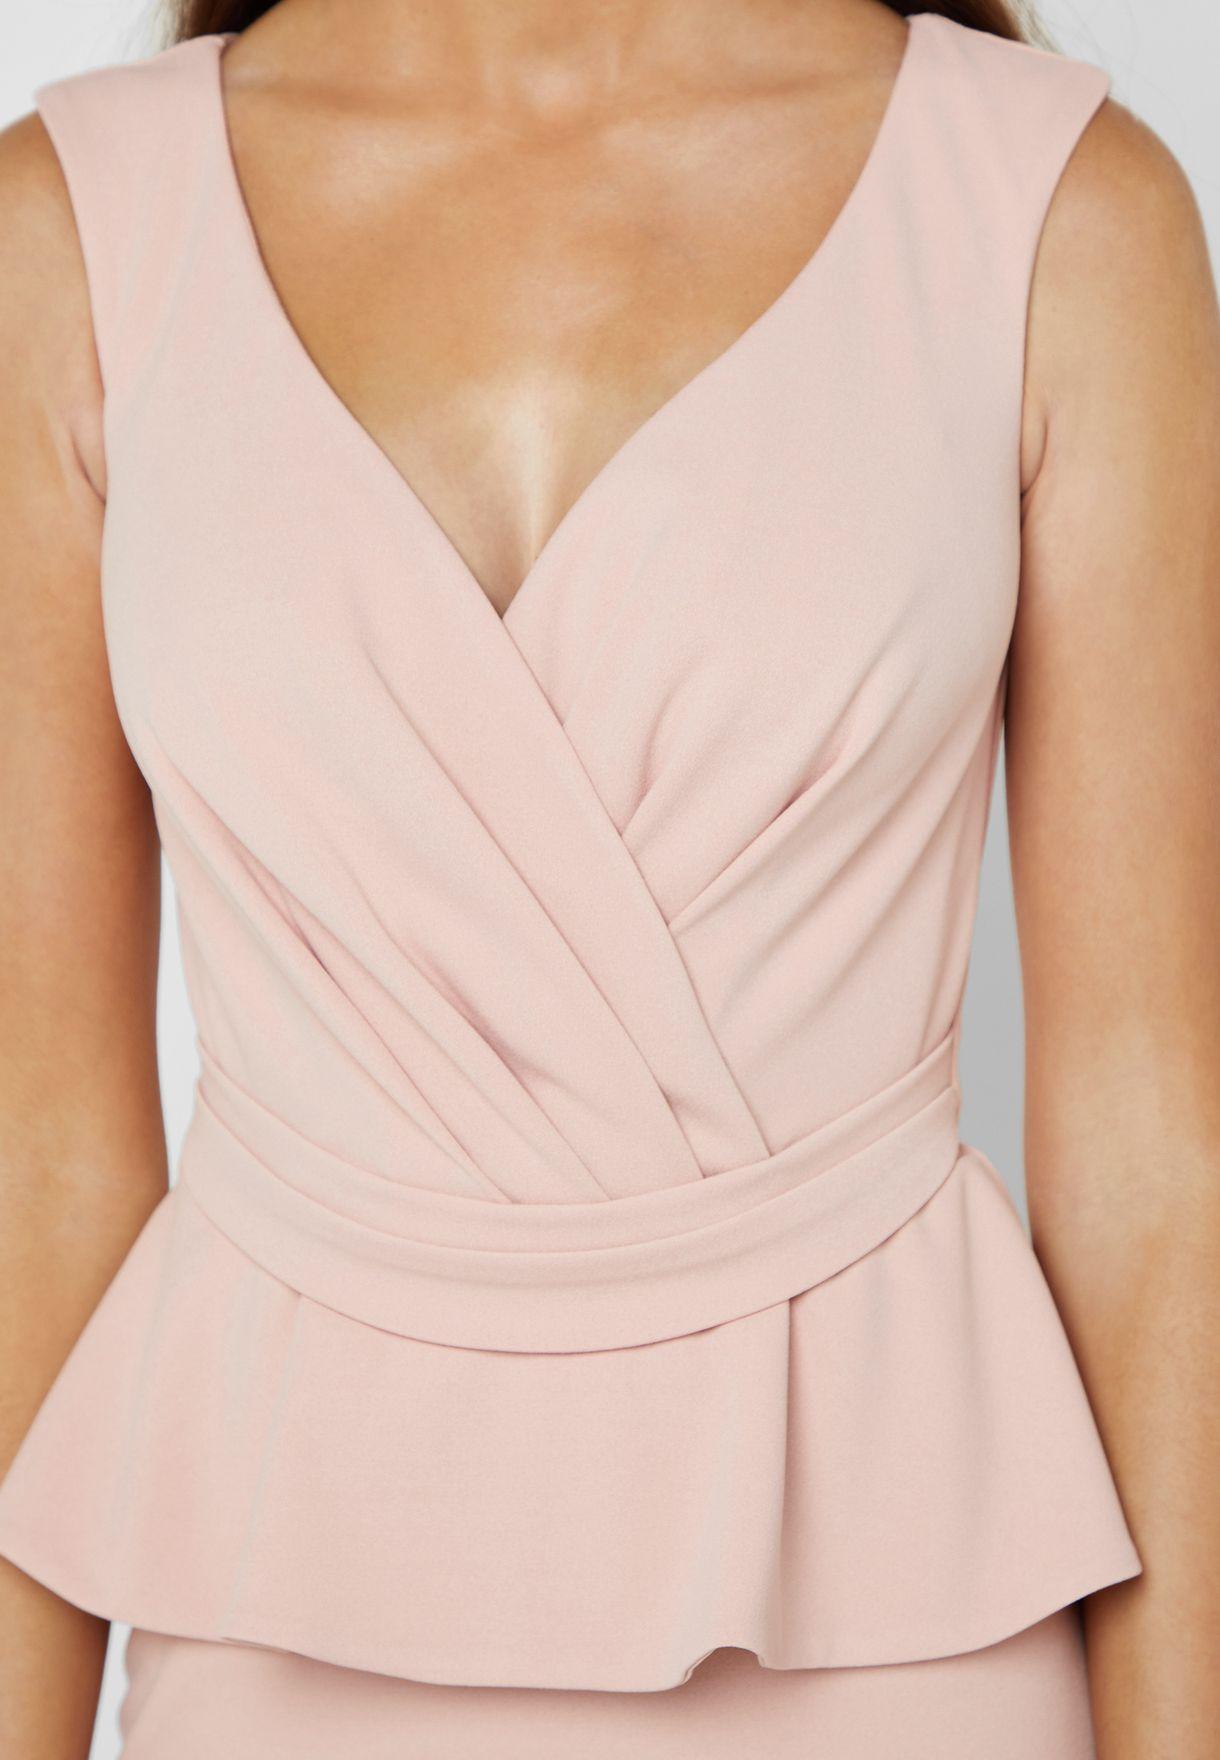 QUIZ Bardot Wrap Peplum Maxi Dress - Women Clothing 1XHTH